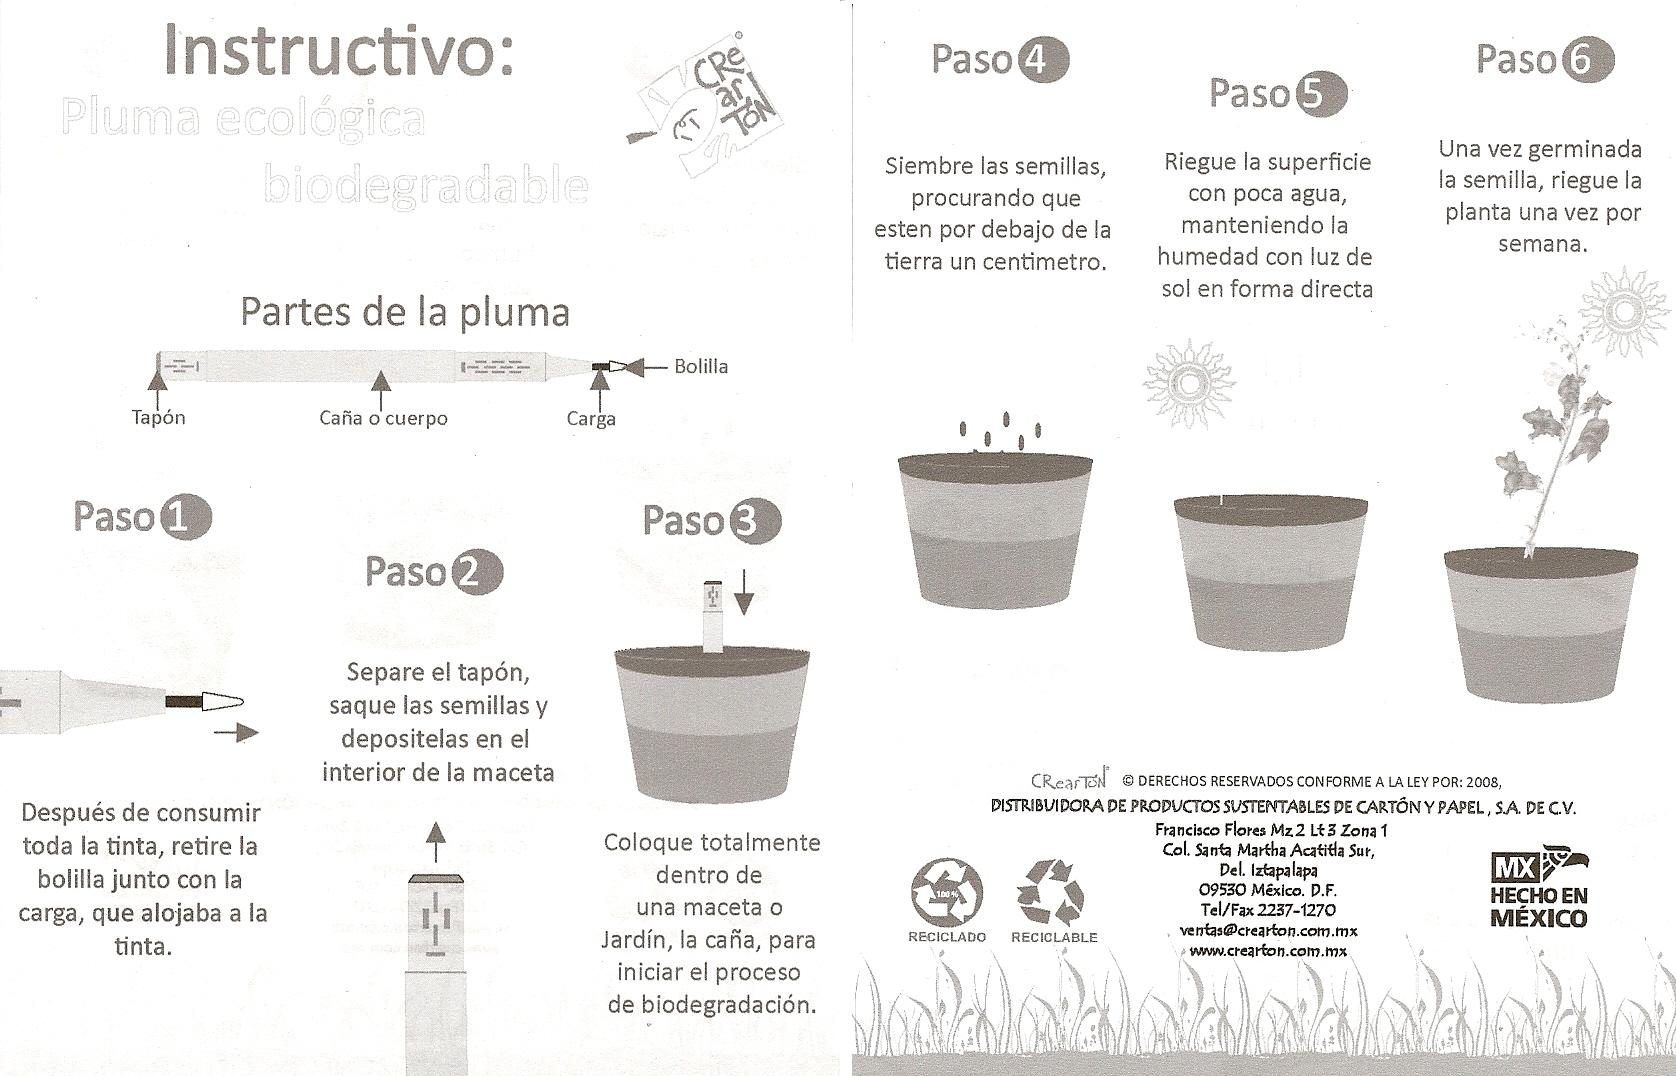 Pluma ecol gica biodegradable pulpito en su tinta for Pasos para sembrar una planta